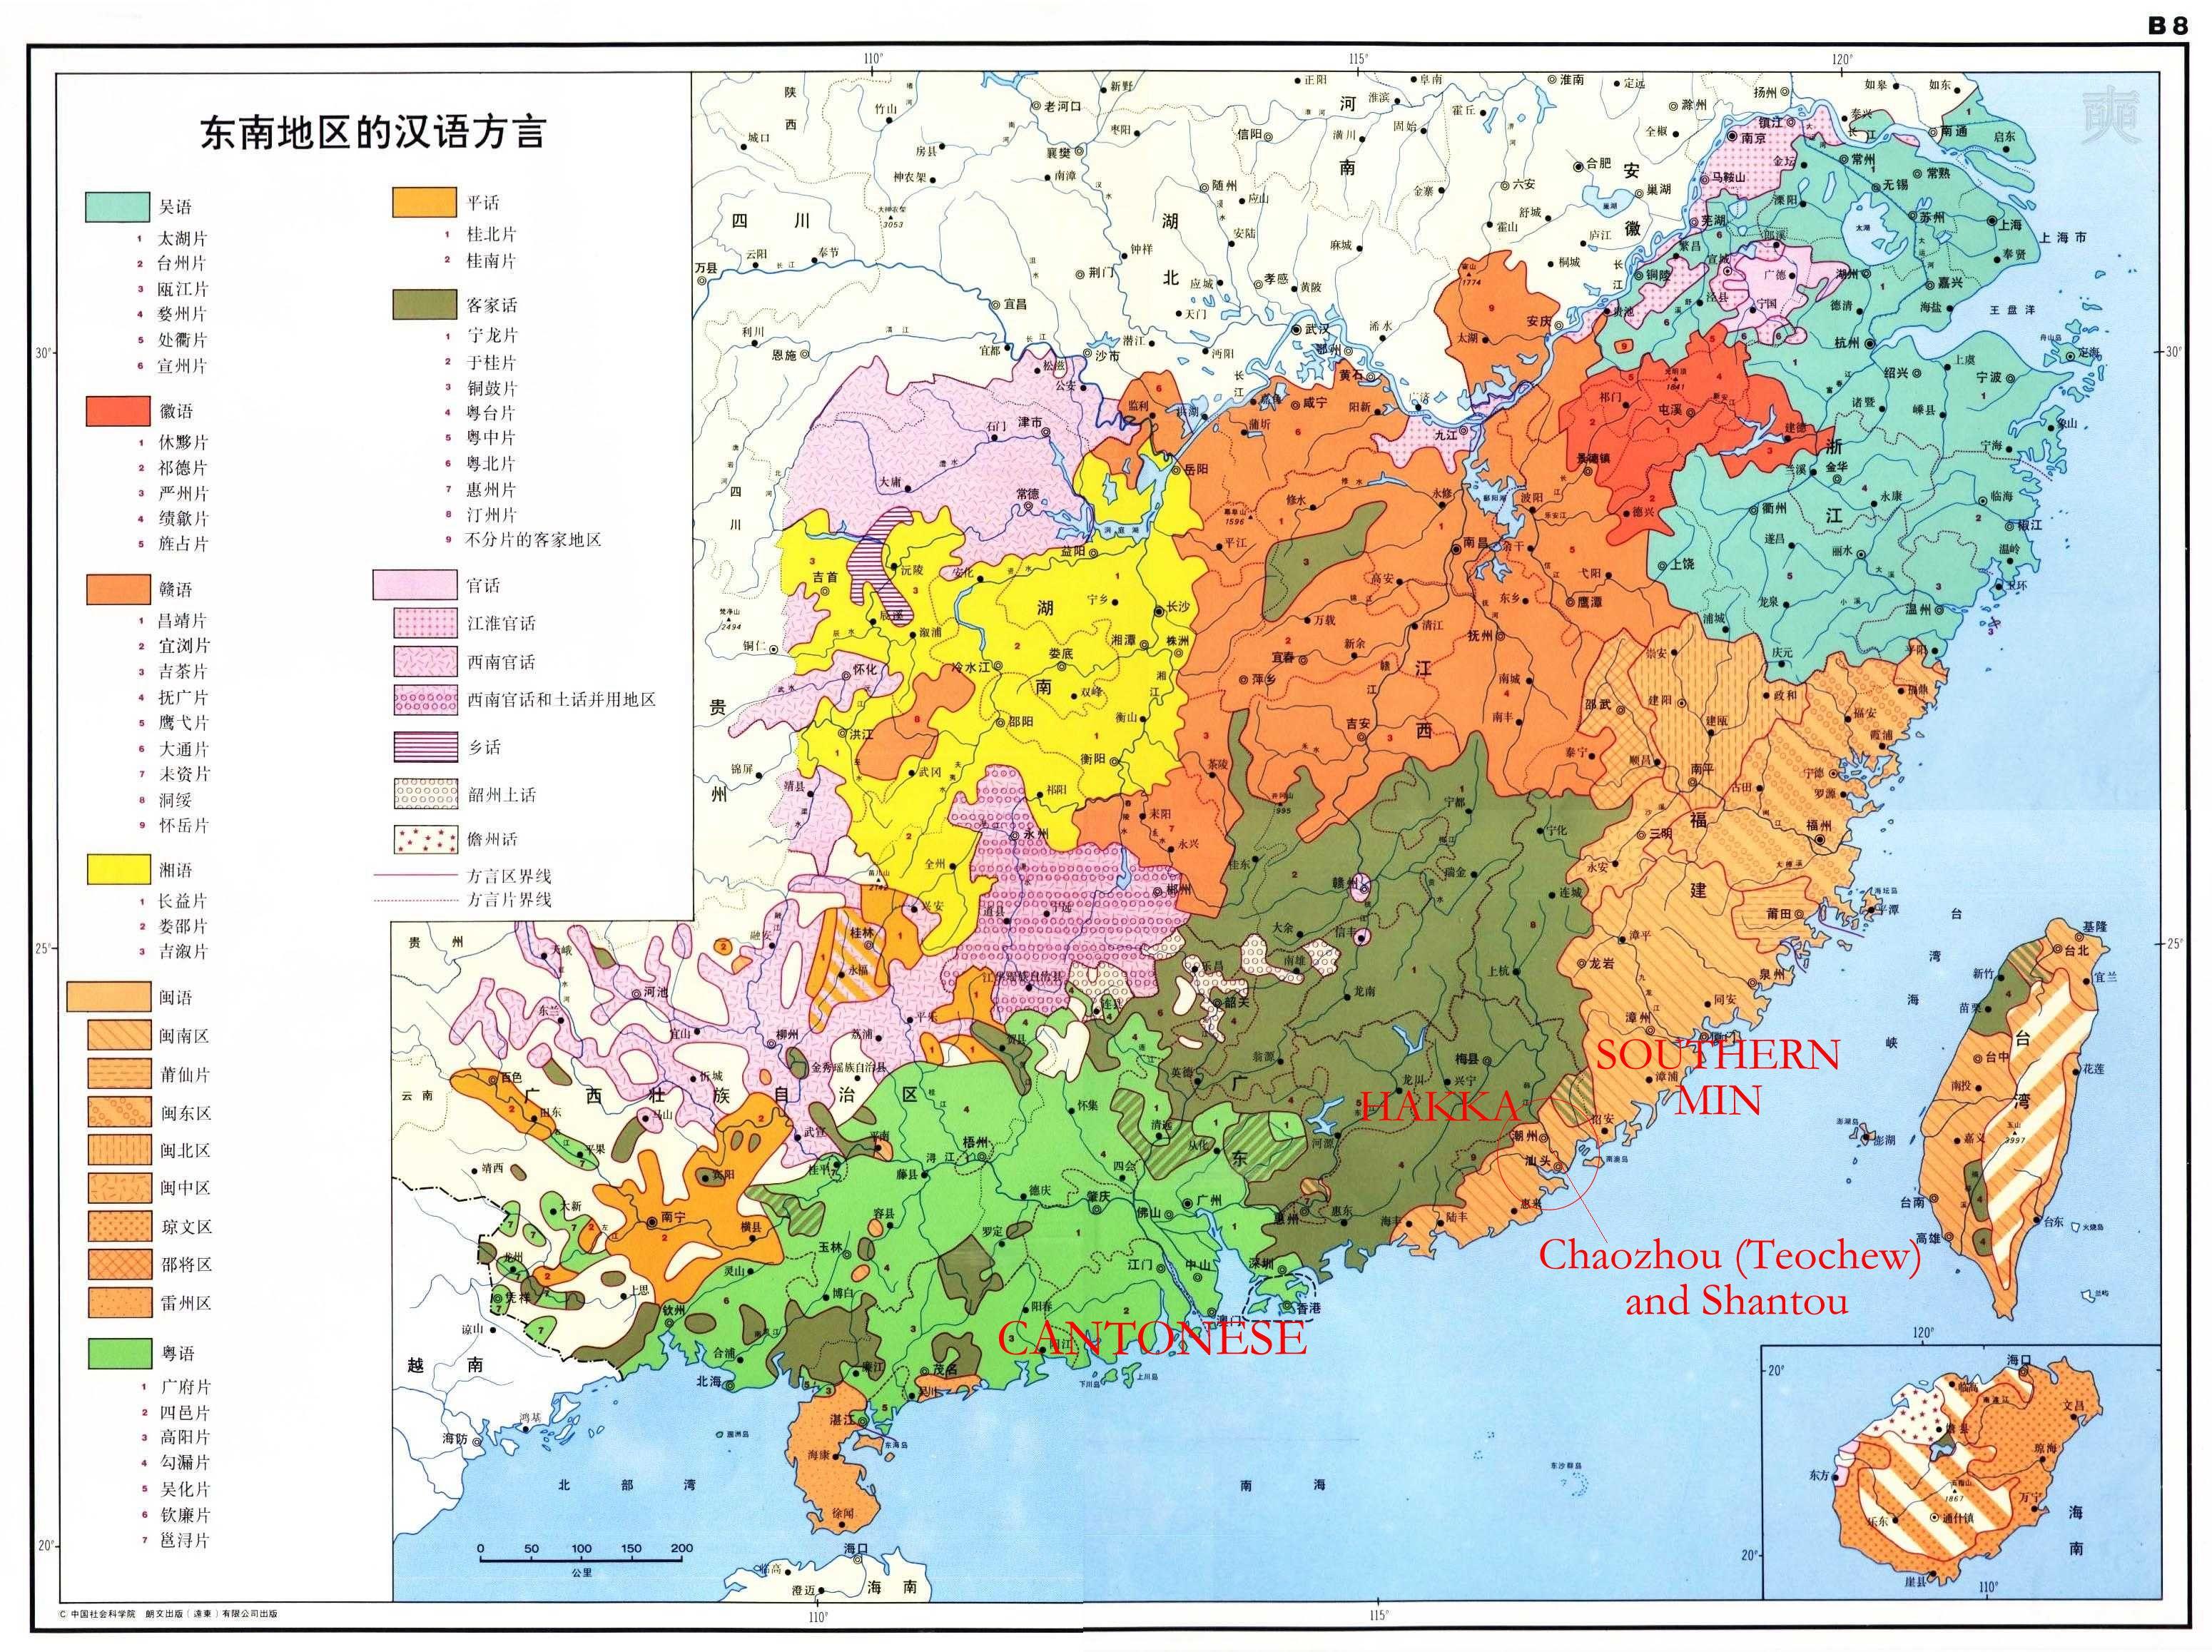 SwatowShantou Teochew And Hakka Dialects Maps Of All Sorts - China language map